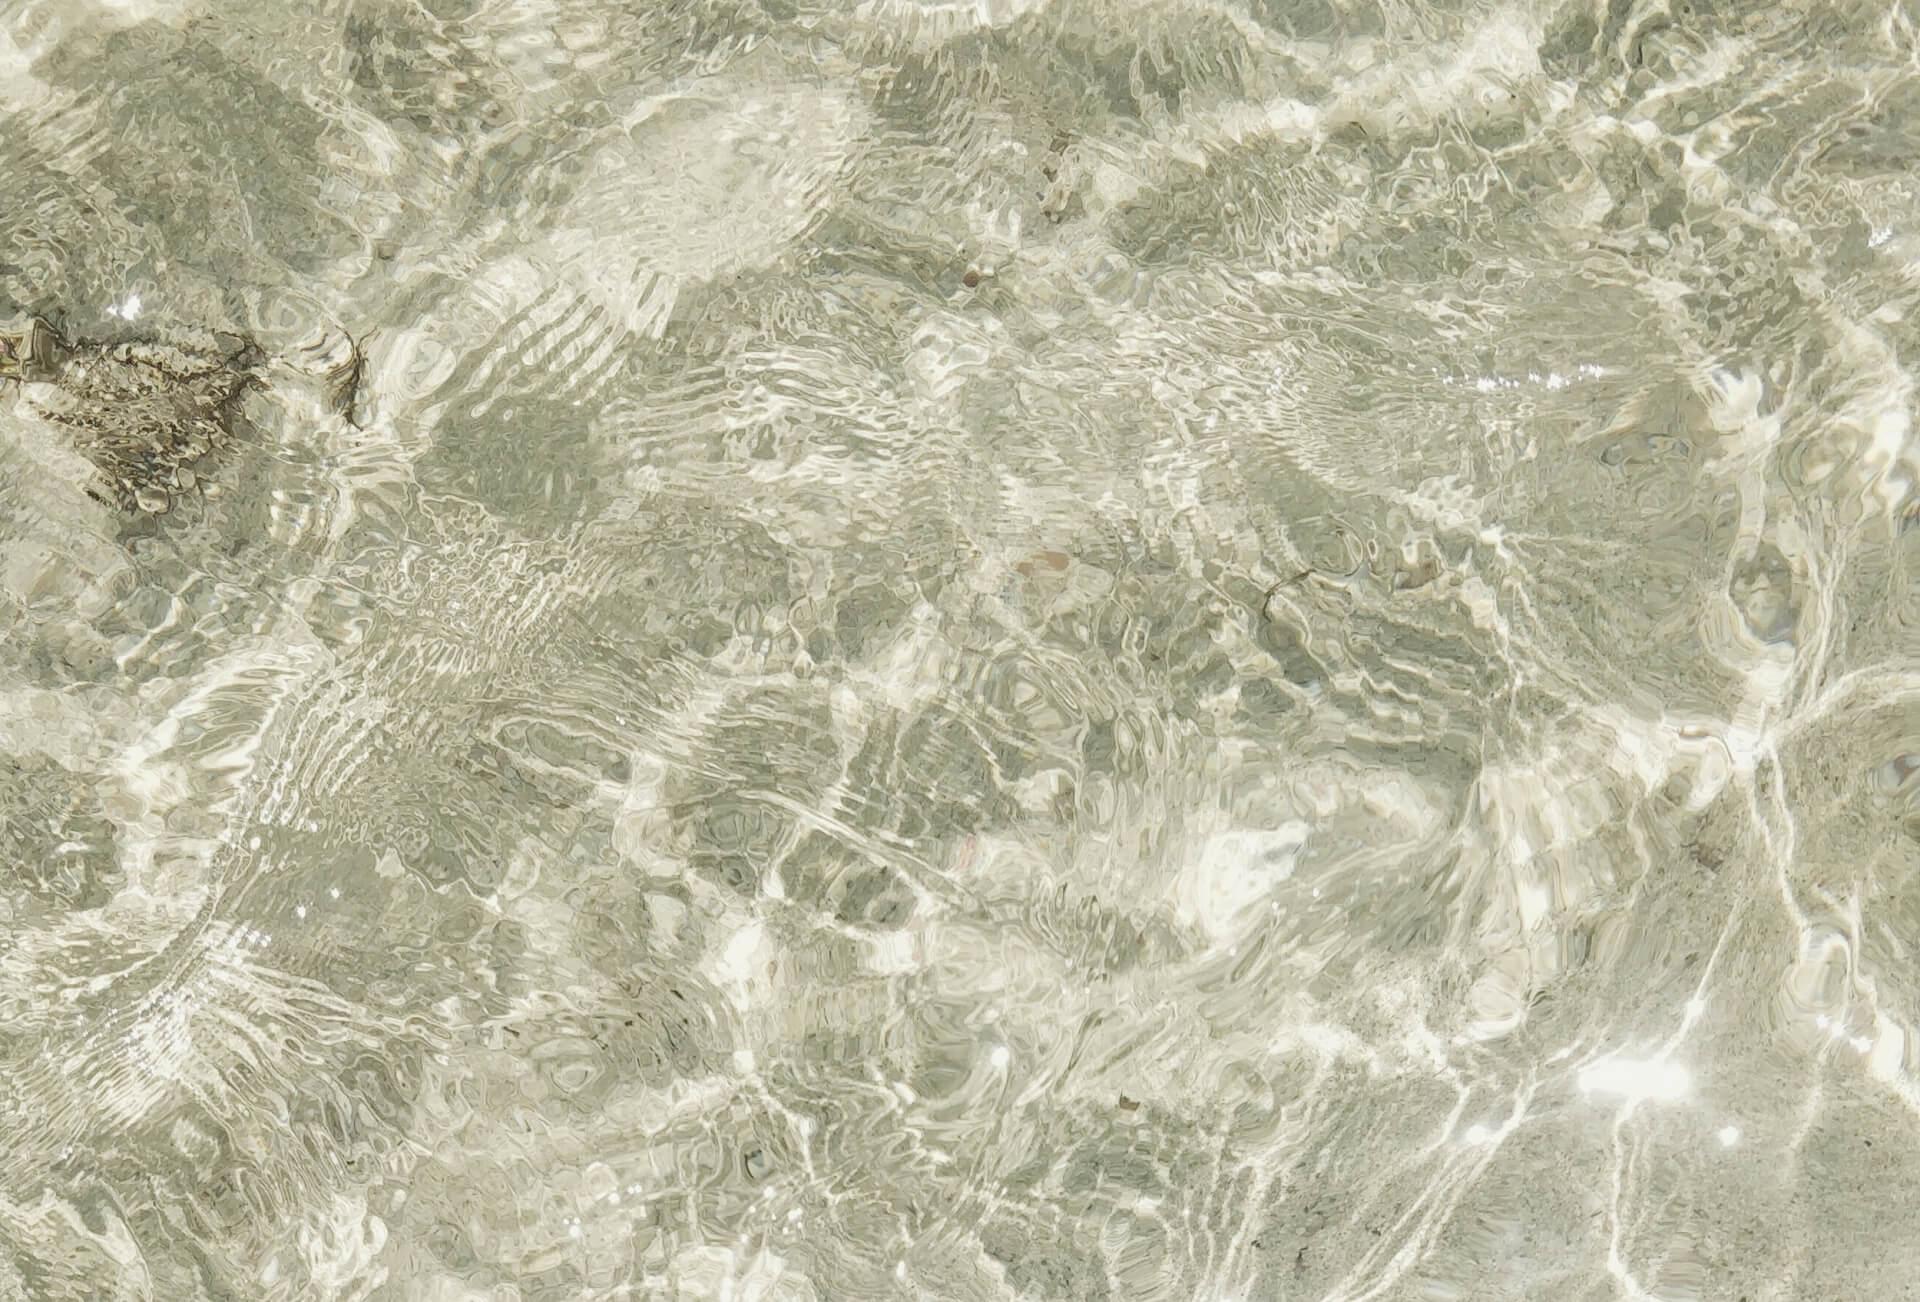 Naturkosmetik Feuchtigkeit trockene Haut